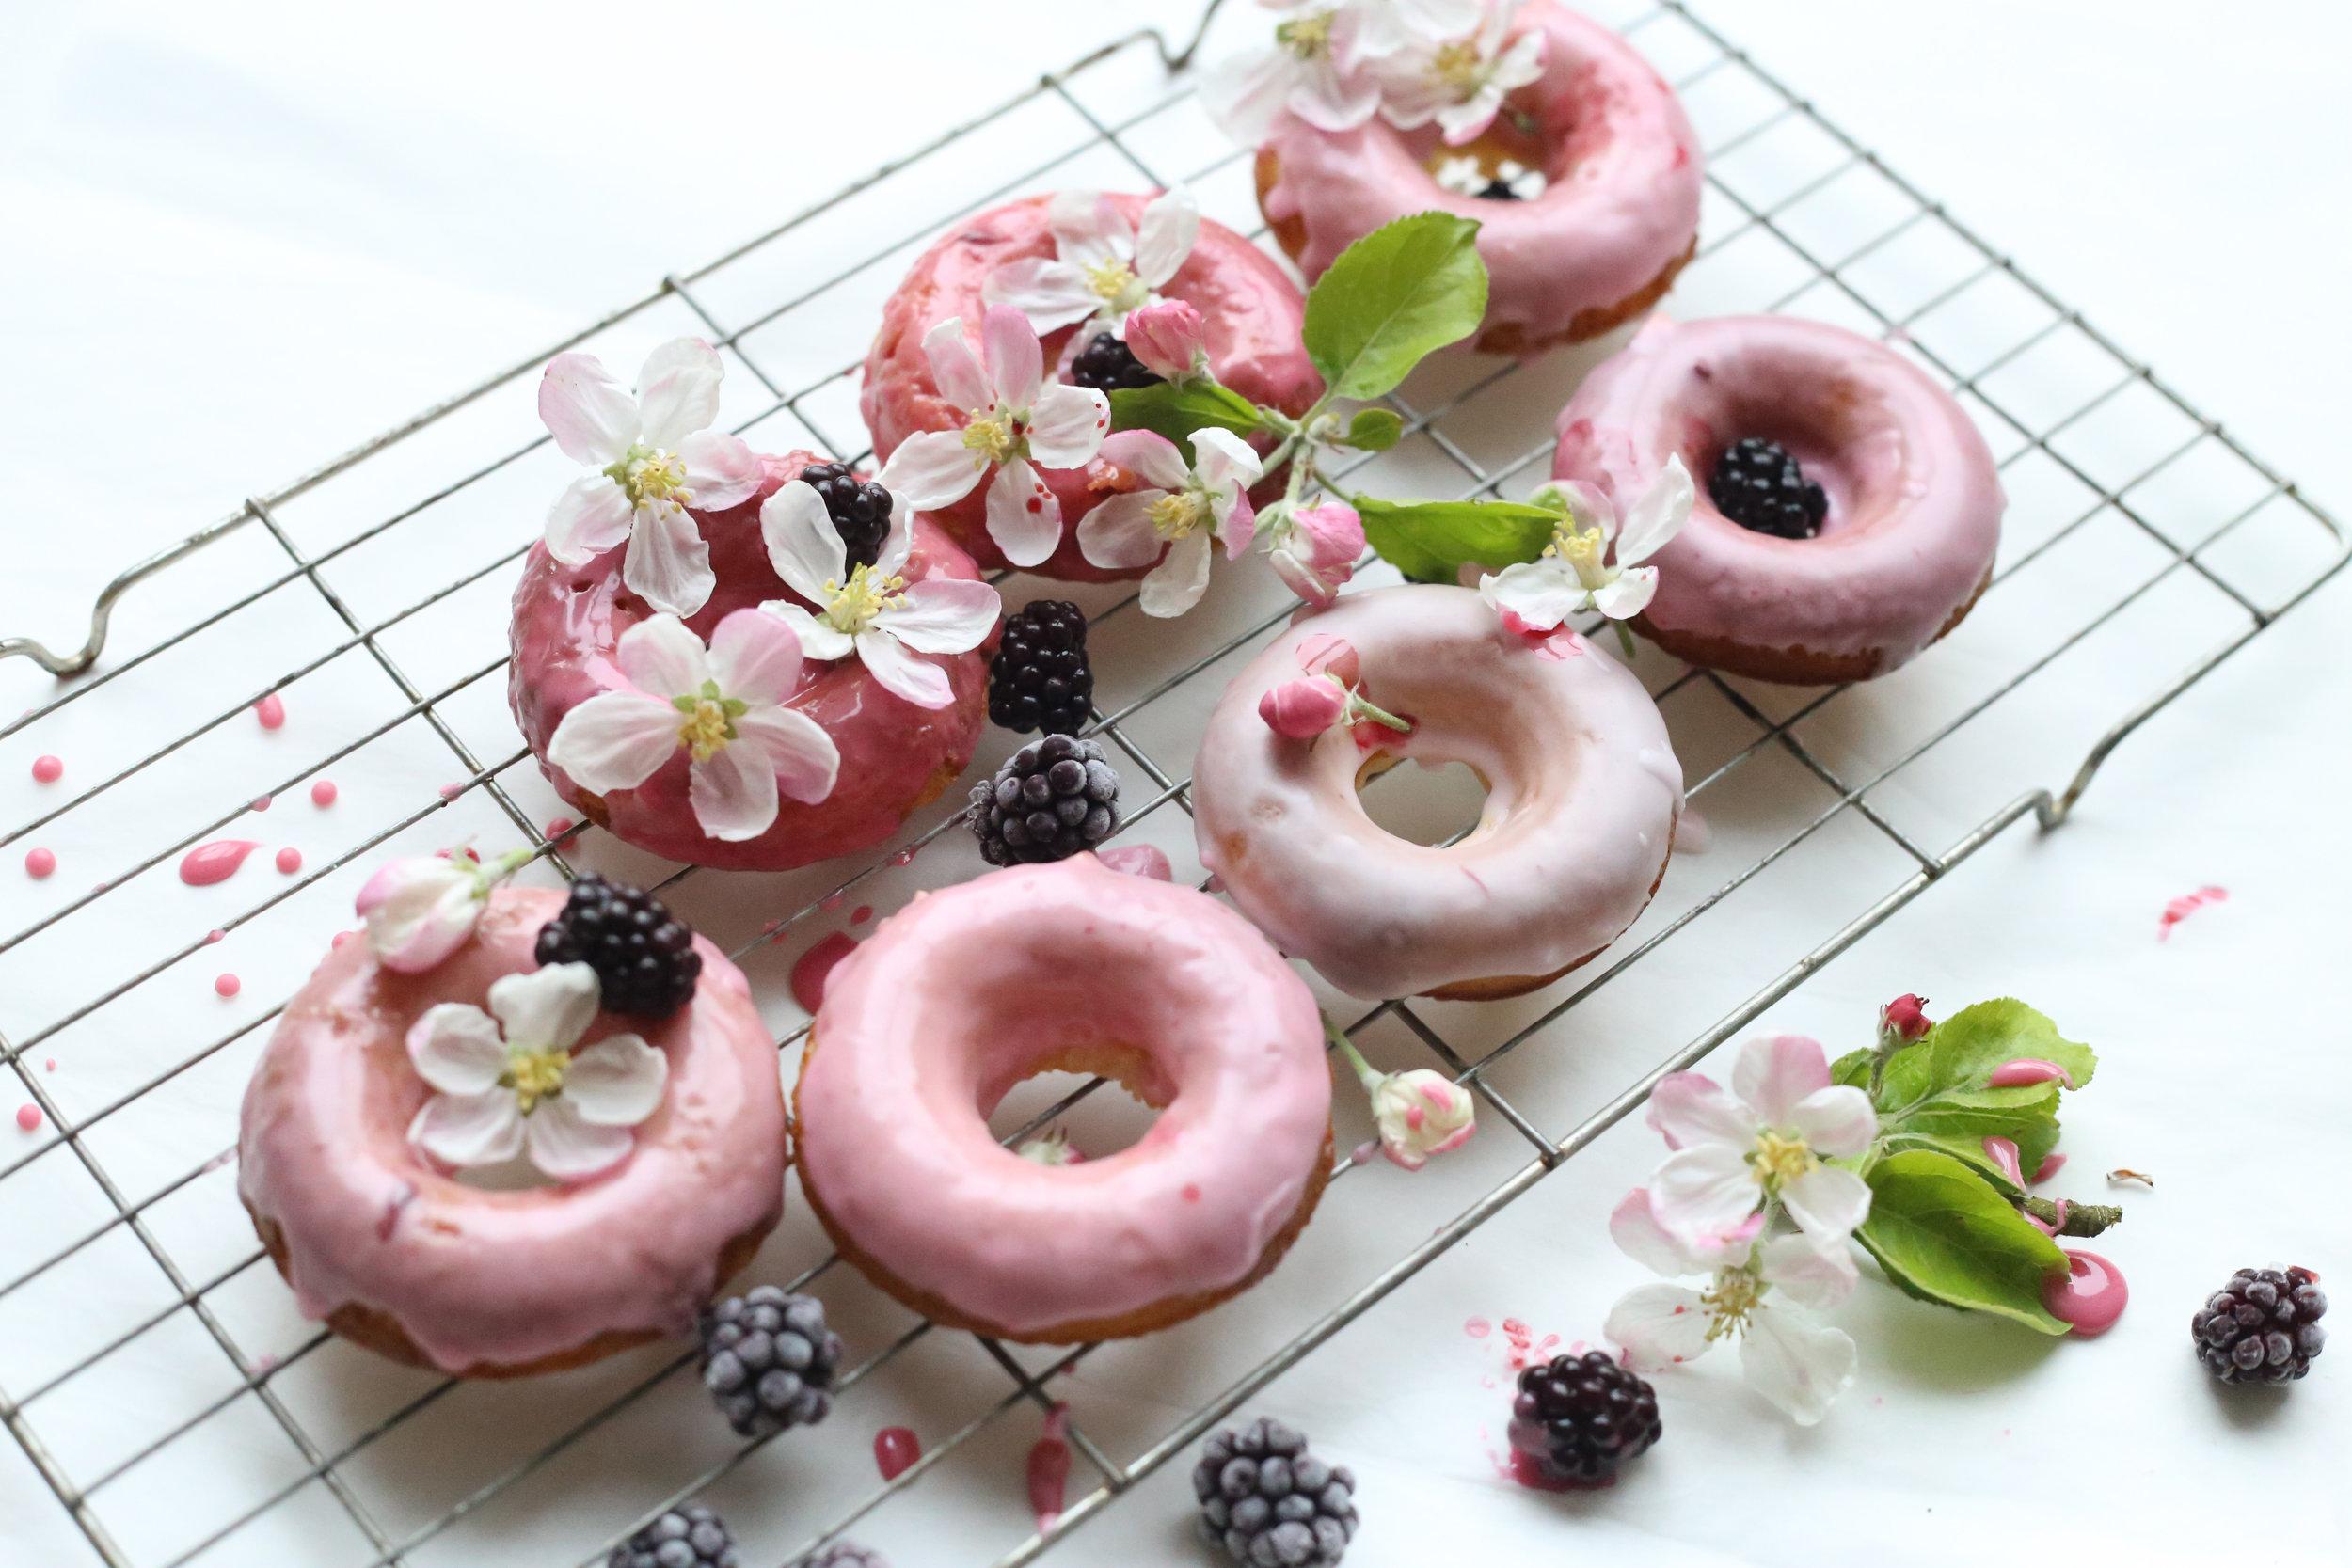 04Mar_Donuts.jpg